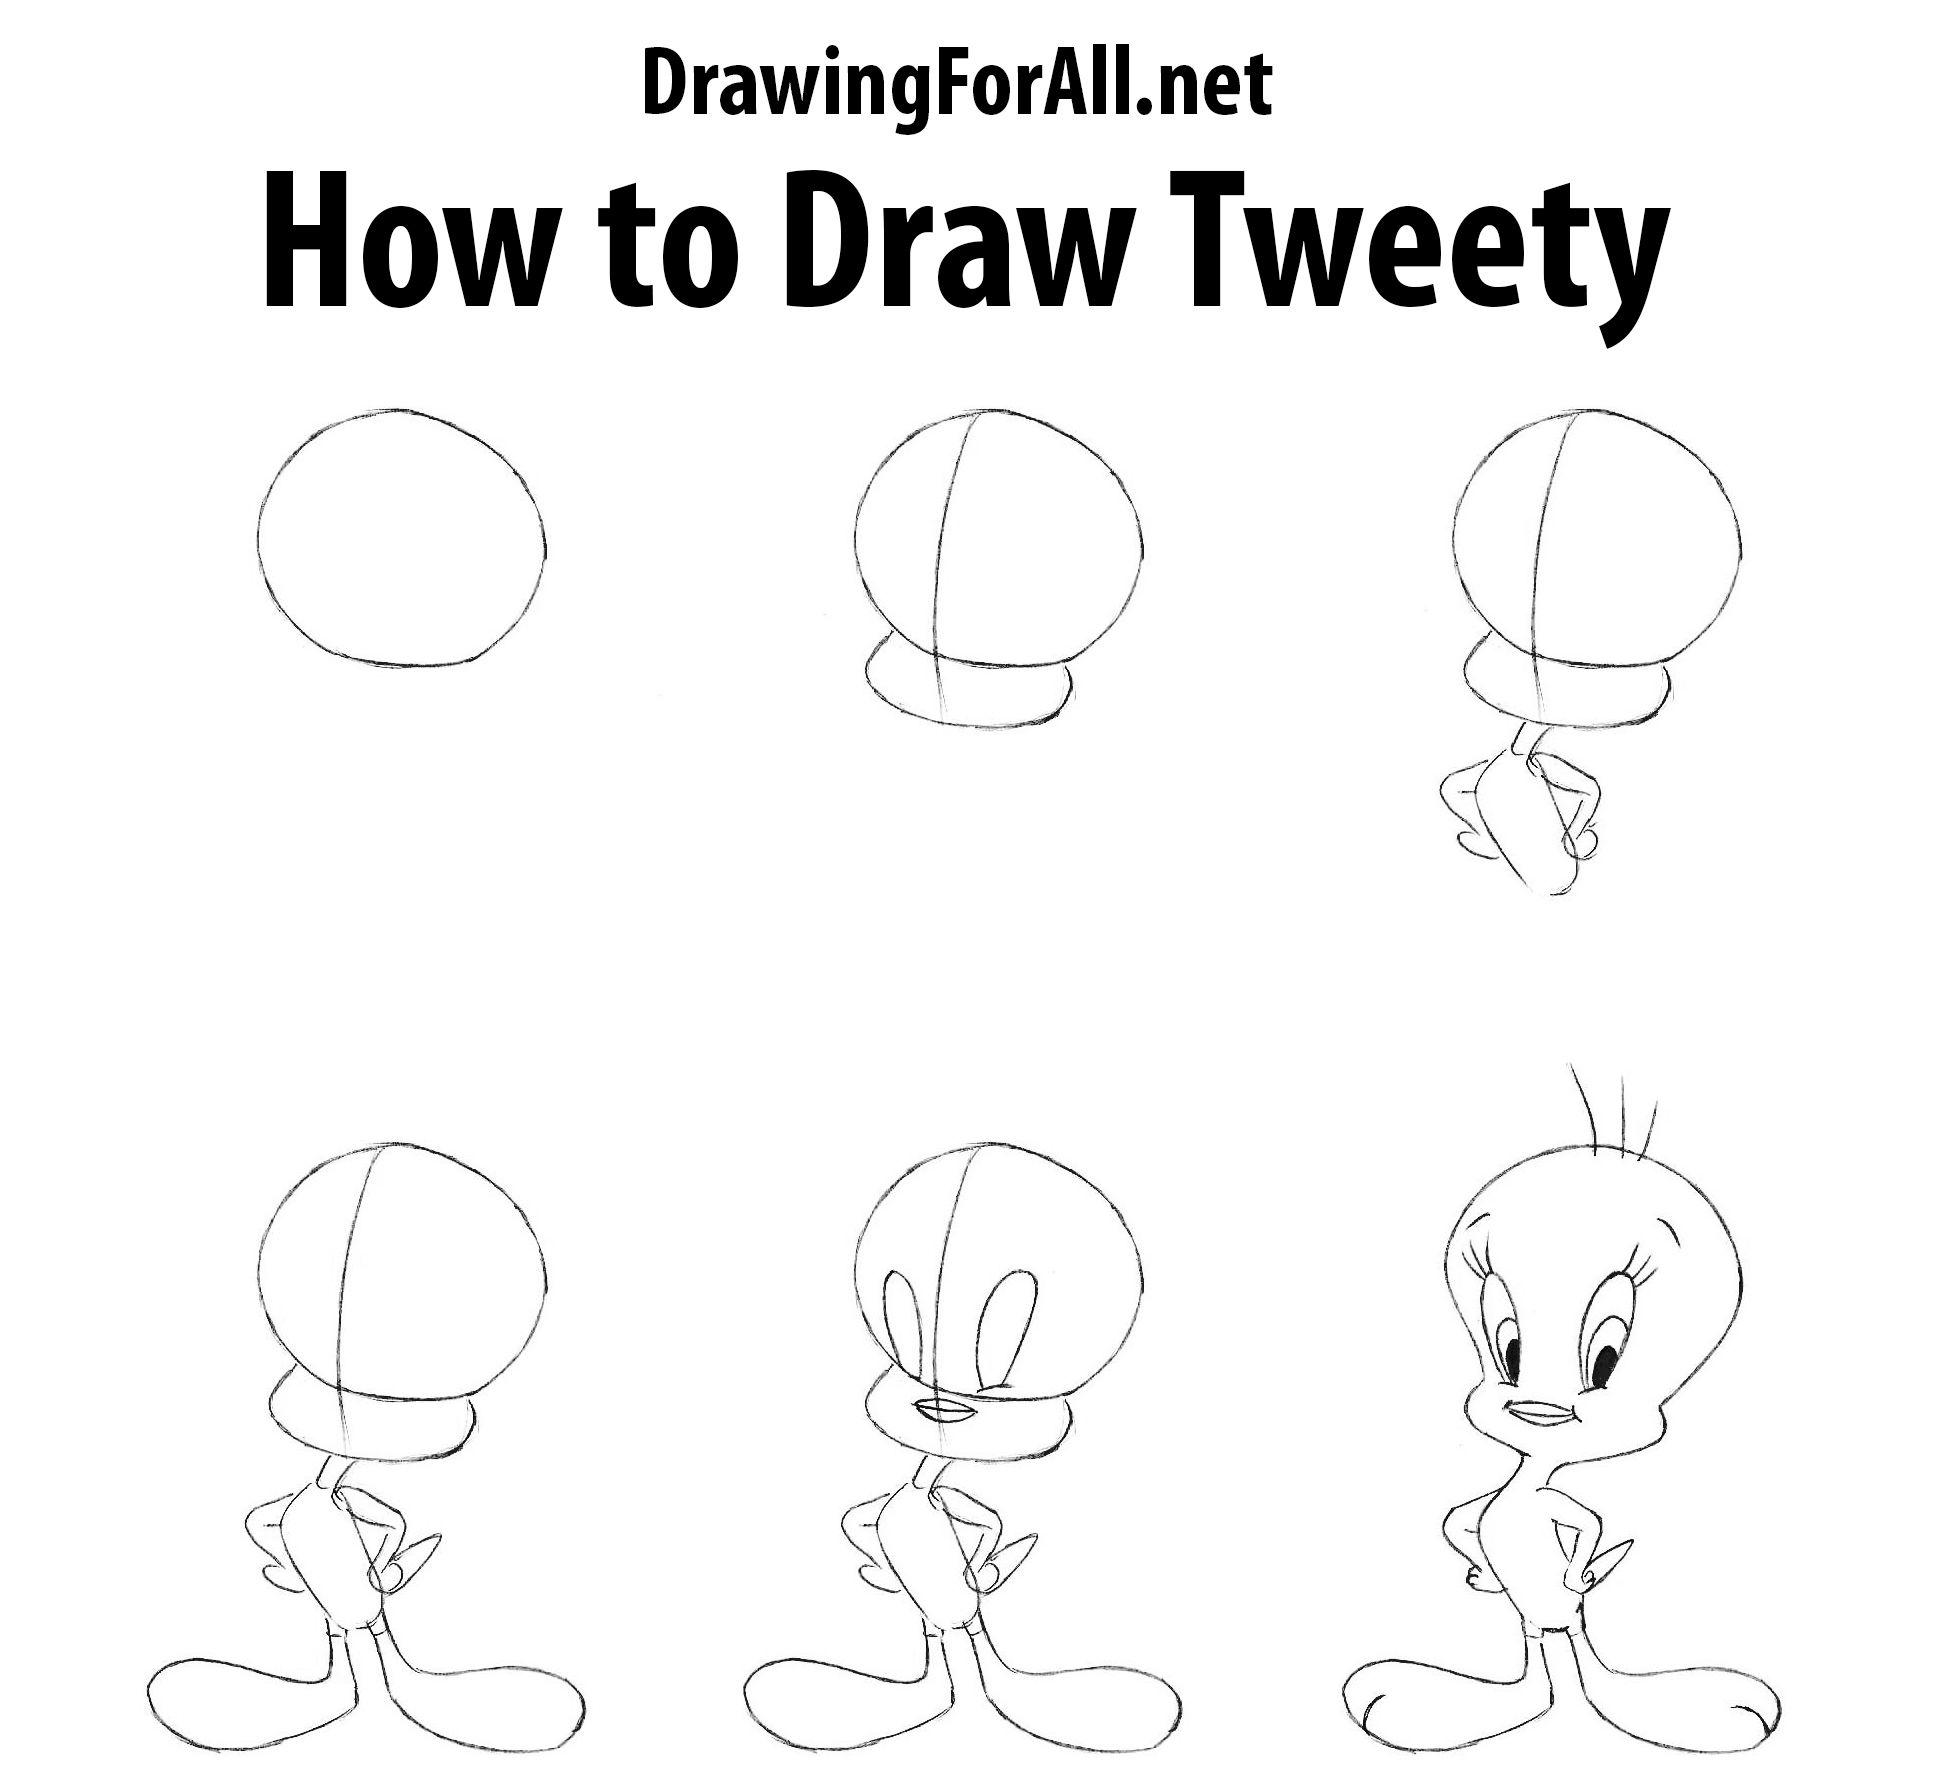 how to draw tweety